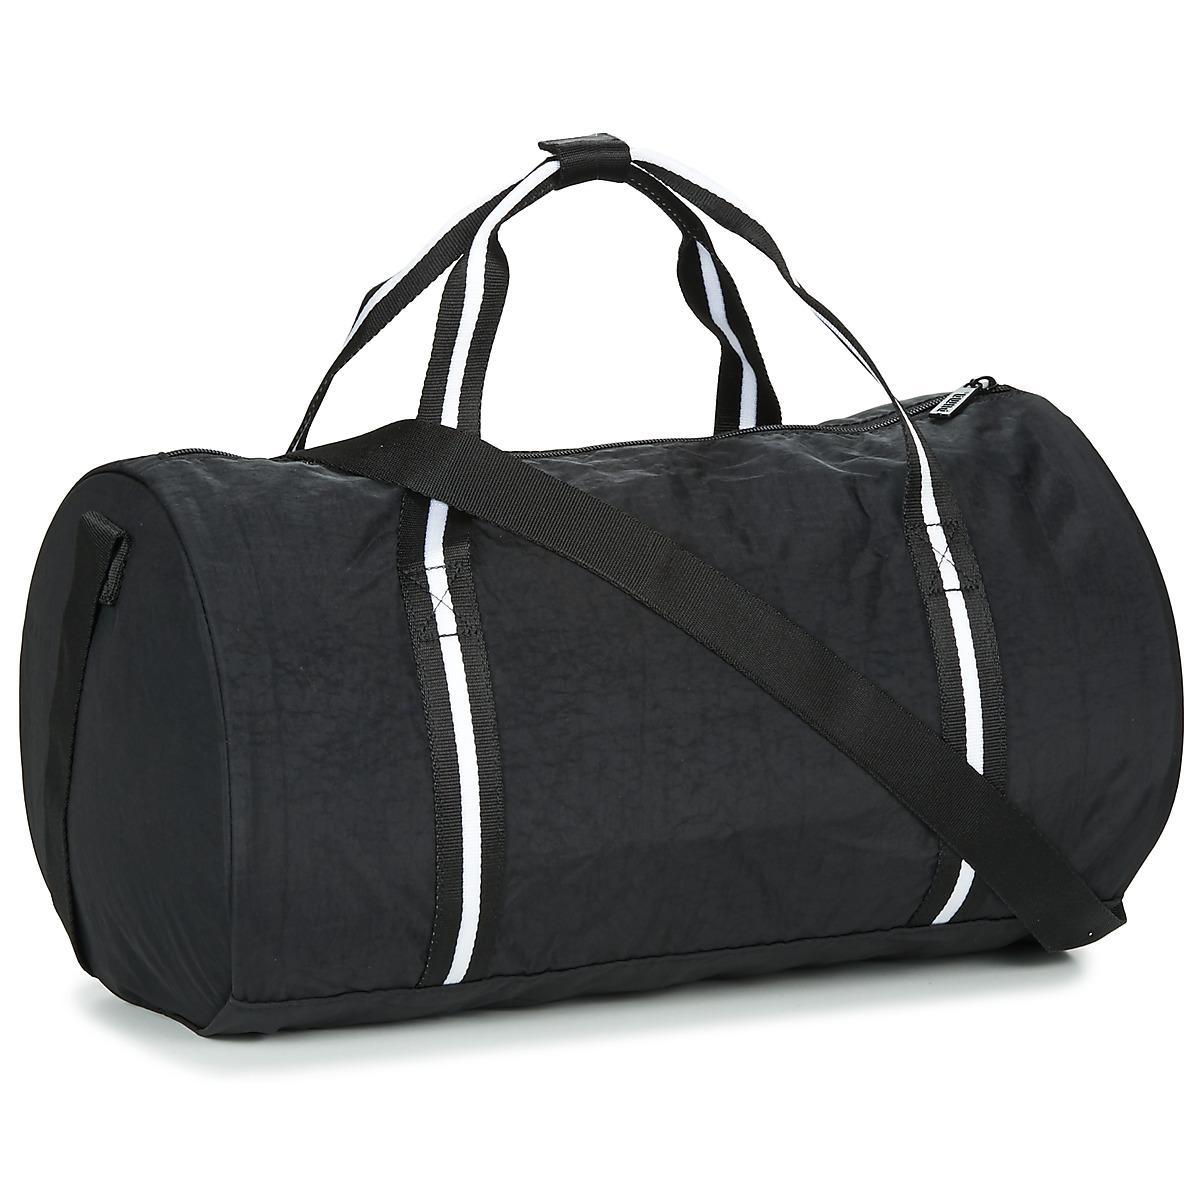 7a929ce327 PUMA Wmn Core Barrel Bag Women s Sports Bag In Black in Black for ...